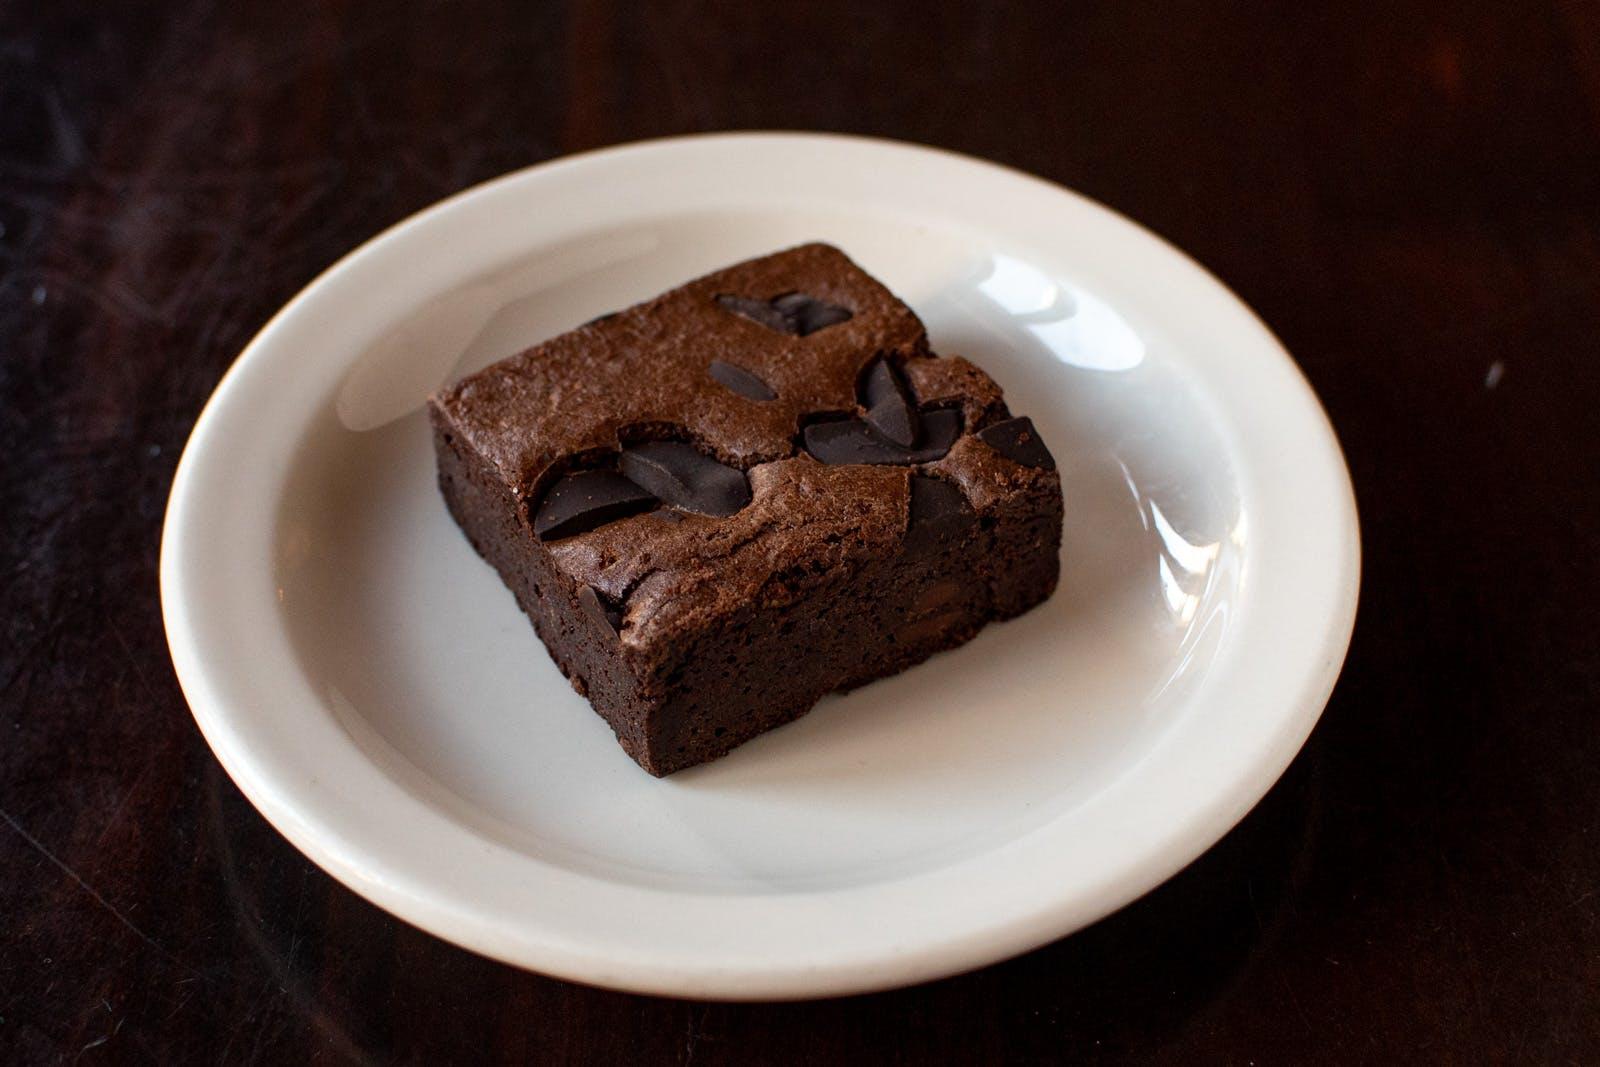 Chocolate Chunk Brownie (GF) from Midcoast Wings - University Ave in Cedar Falls, IA